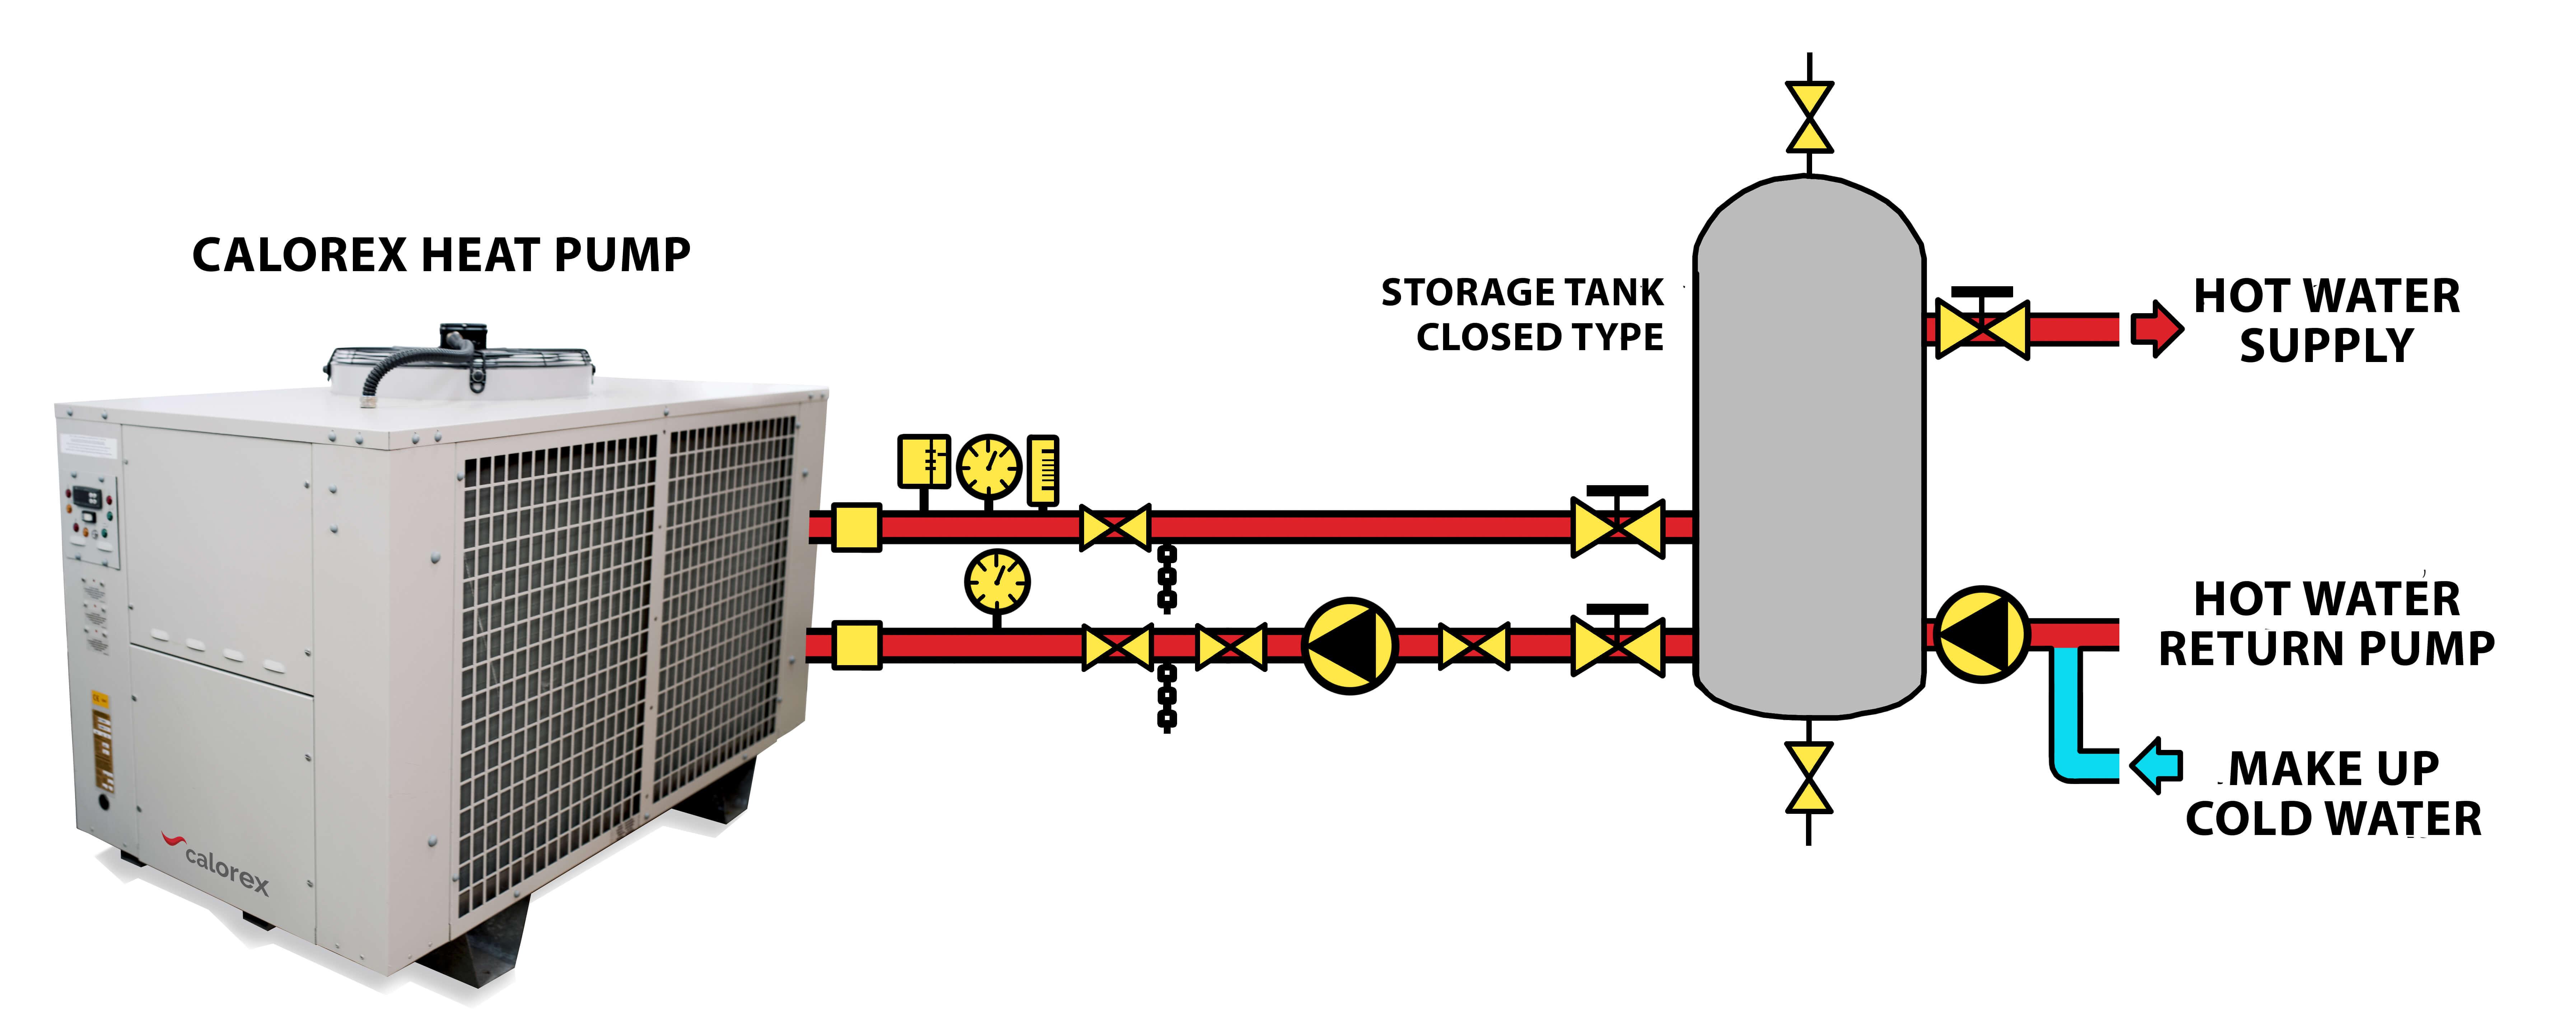 Typical installation diagram for Calorex hot water heat pump